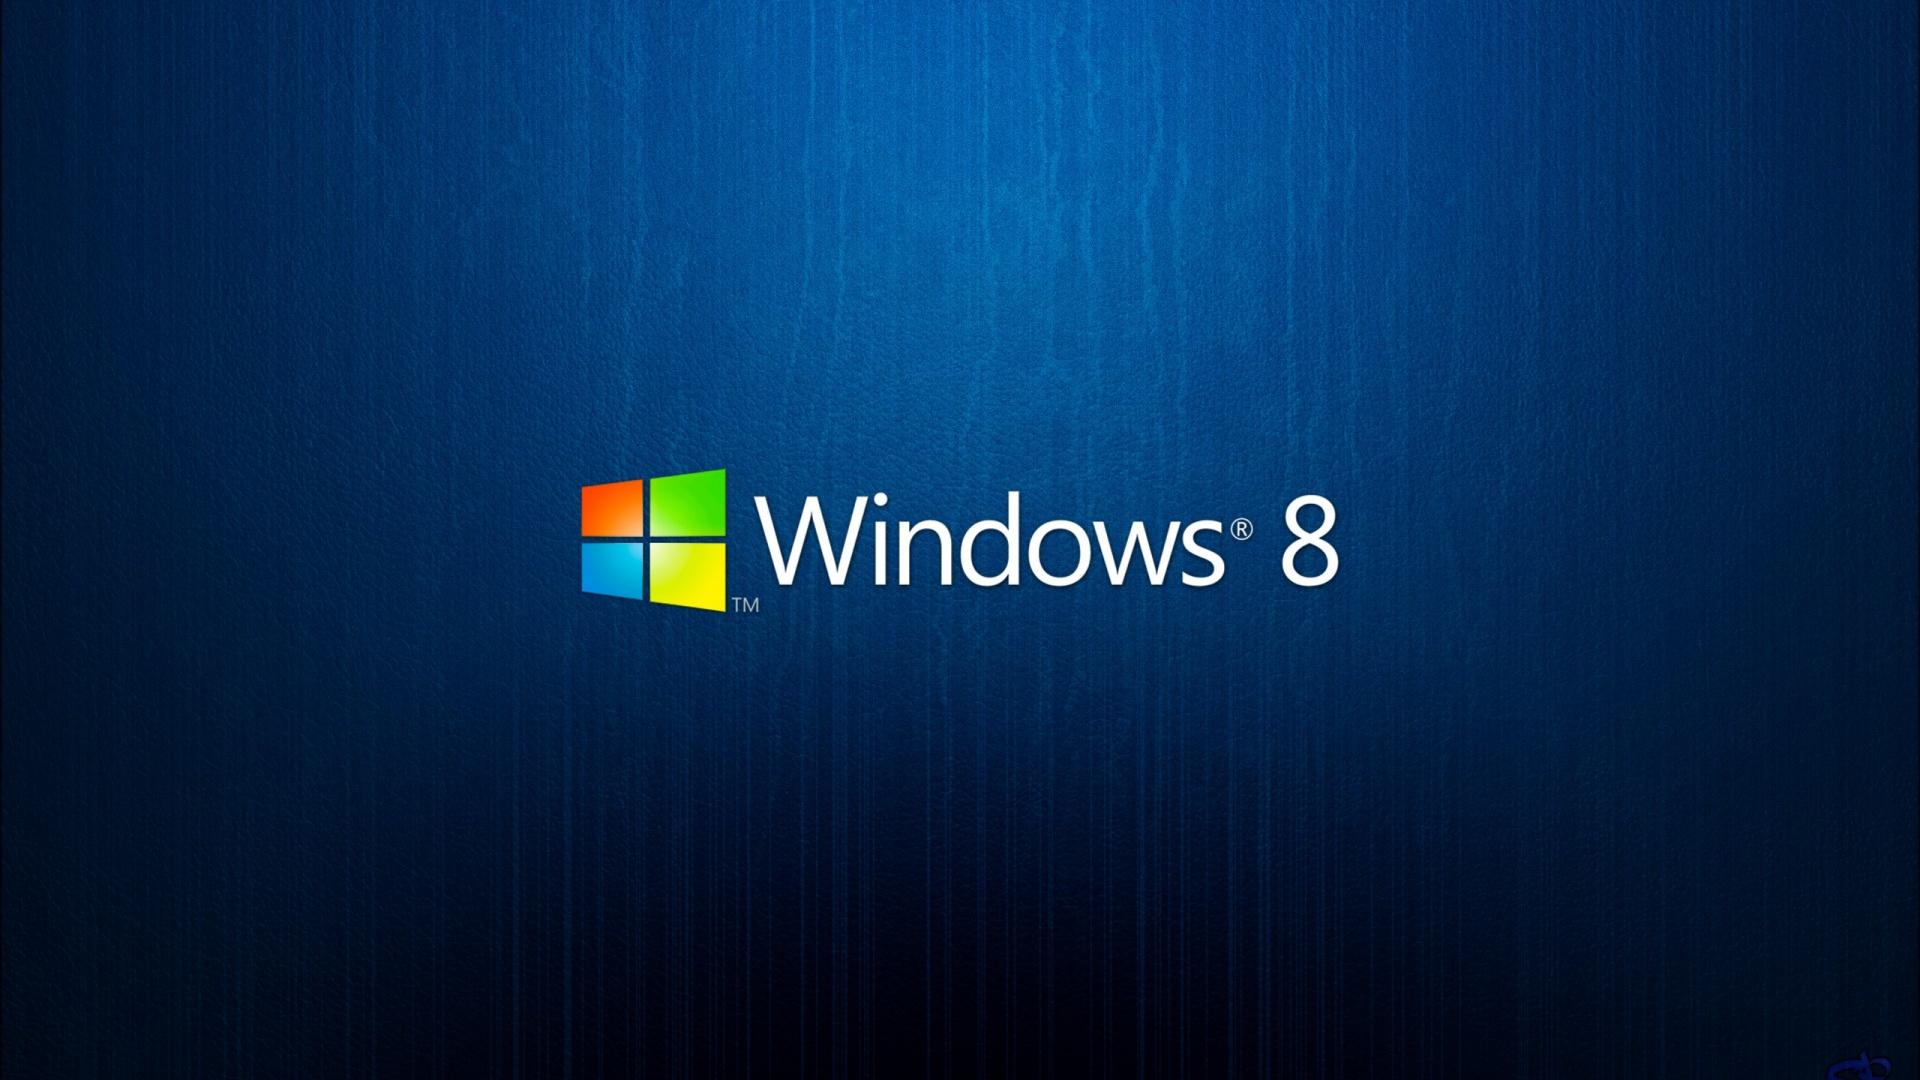 Windows 8 Wallpaper